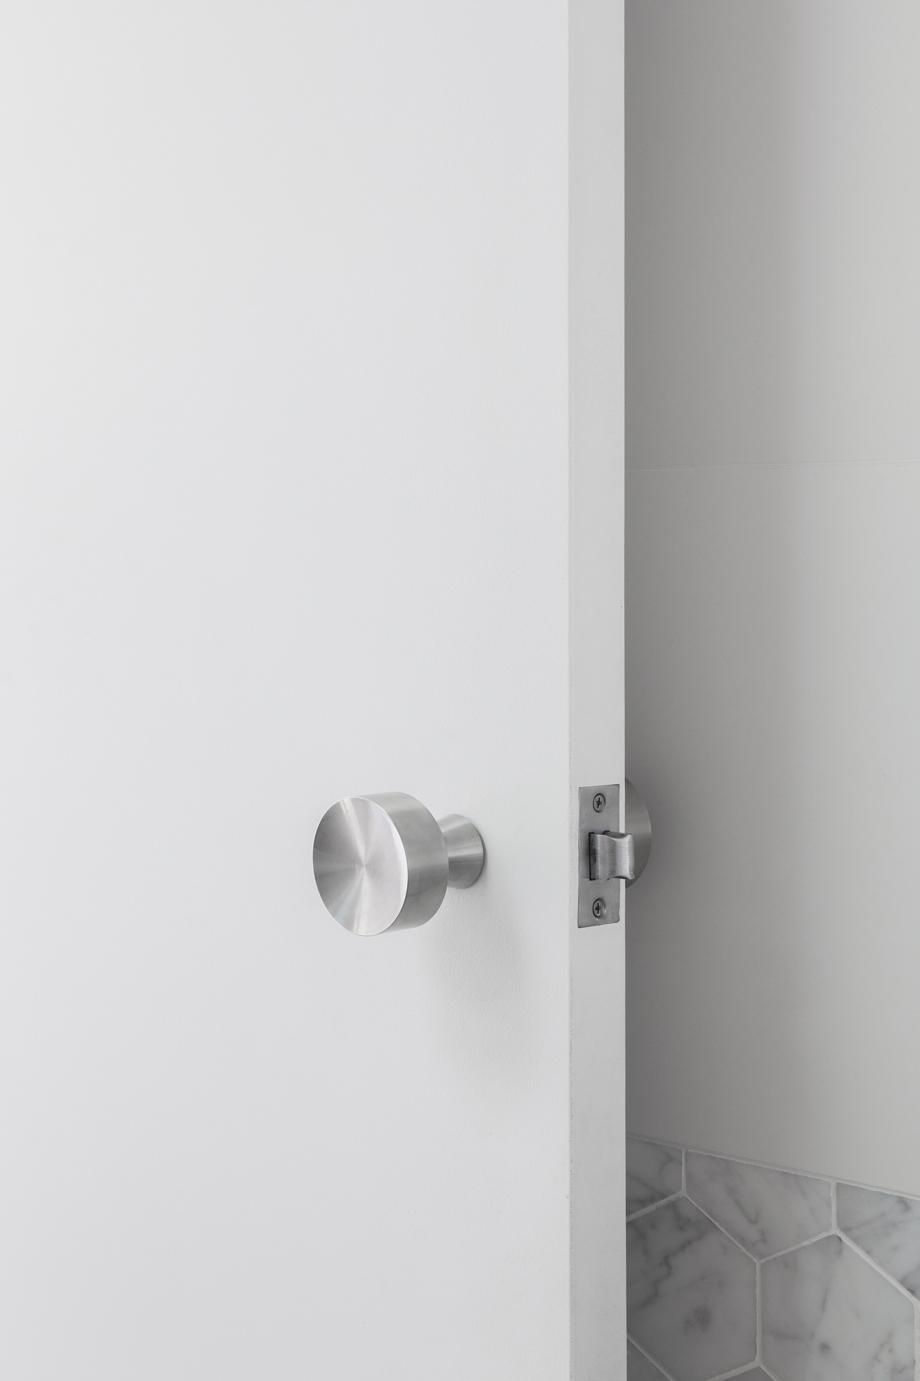 BitPart-Kat Lu-Door Knob-Stainless Steel-Latch.jpg